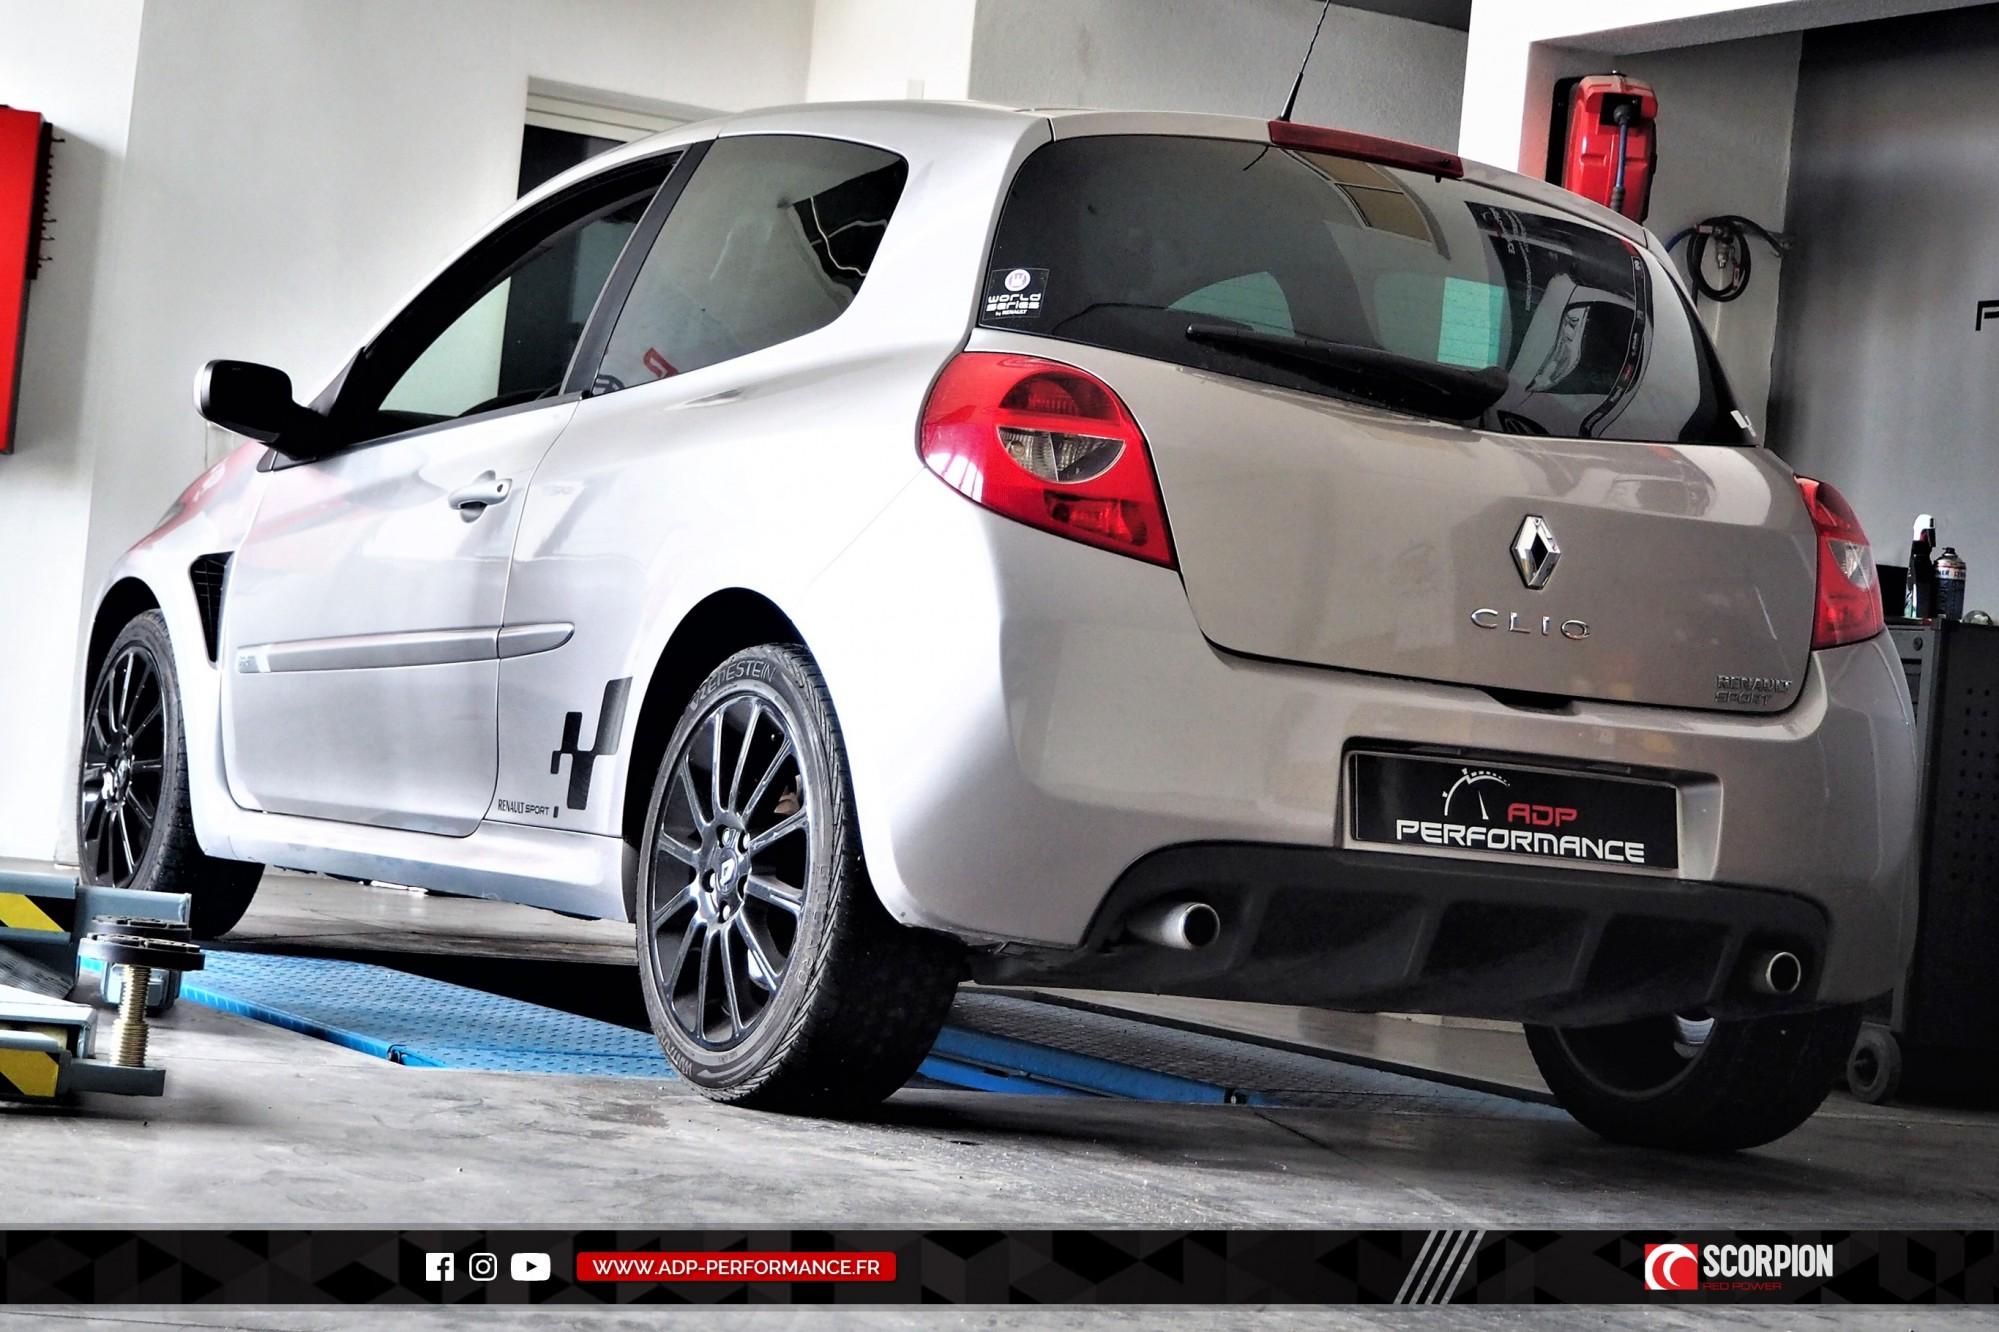 Catback Scorpion Arles - Renault Clio 3 RS - ADP Performance